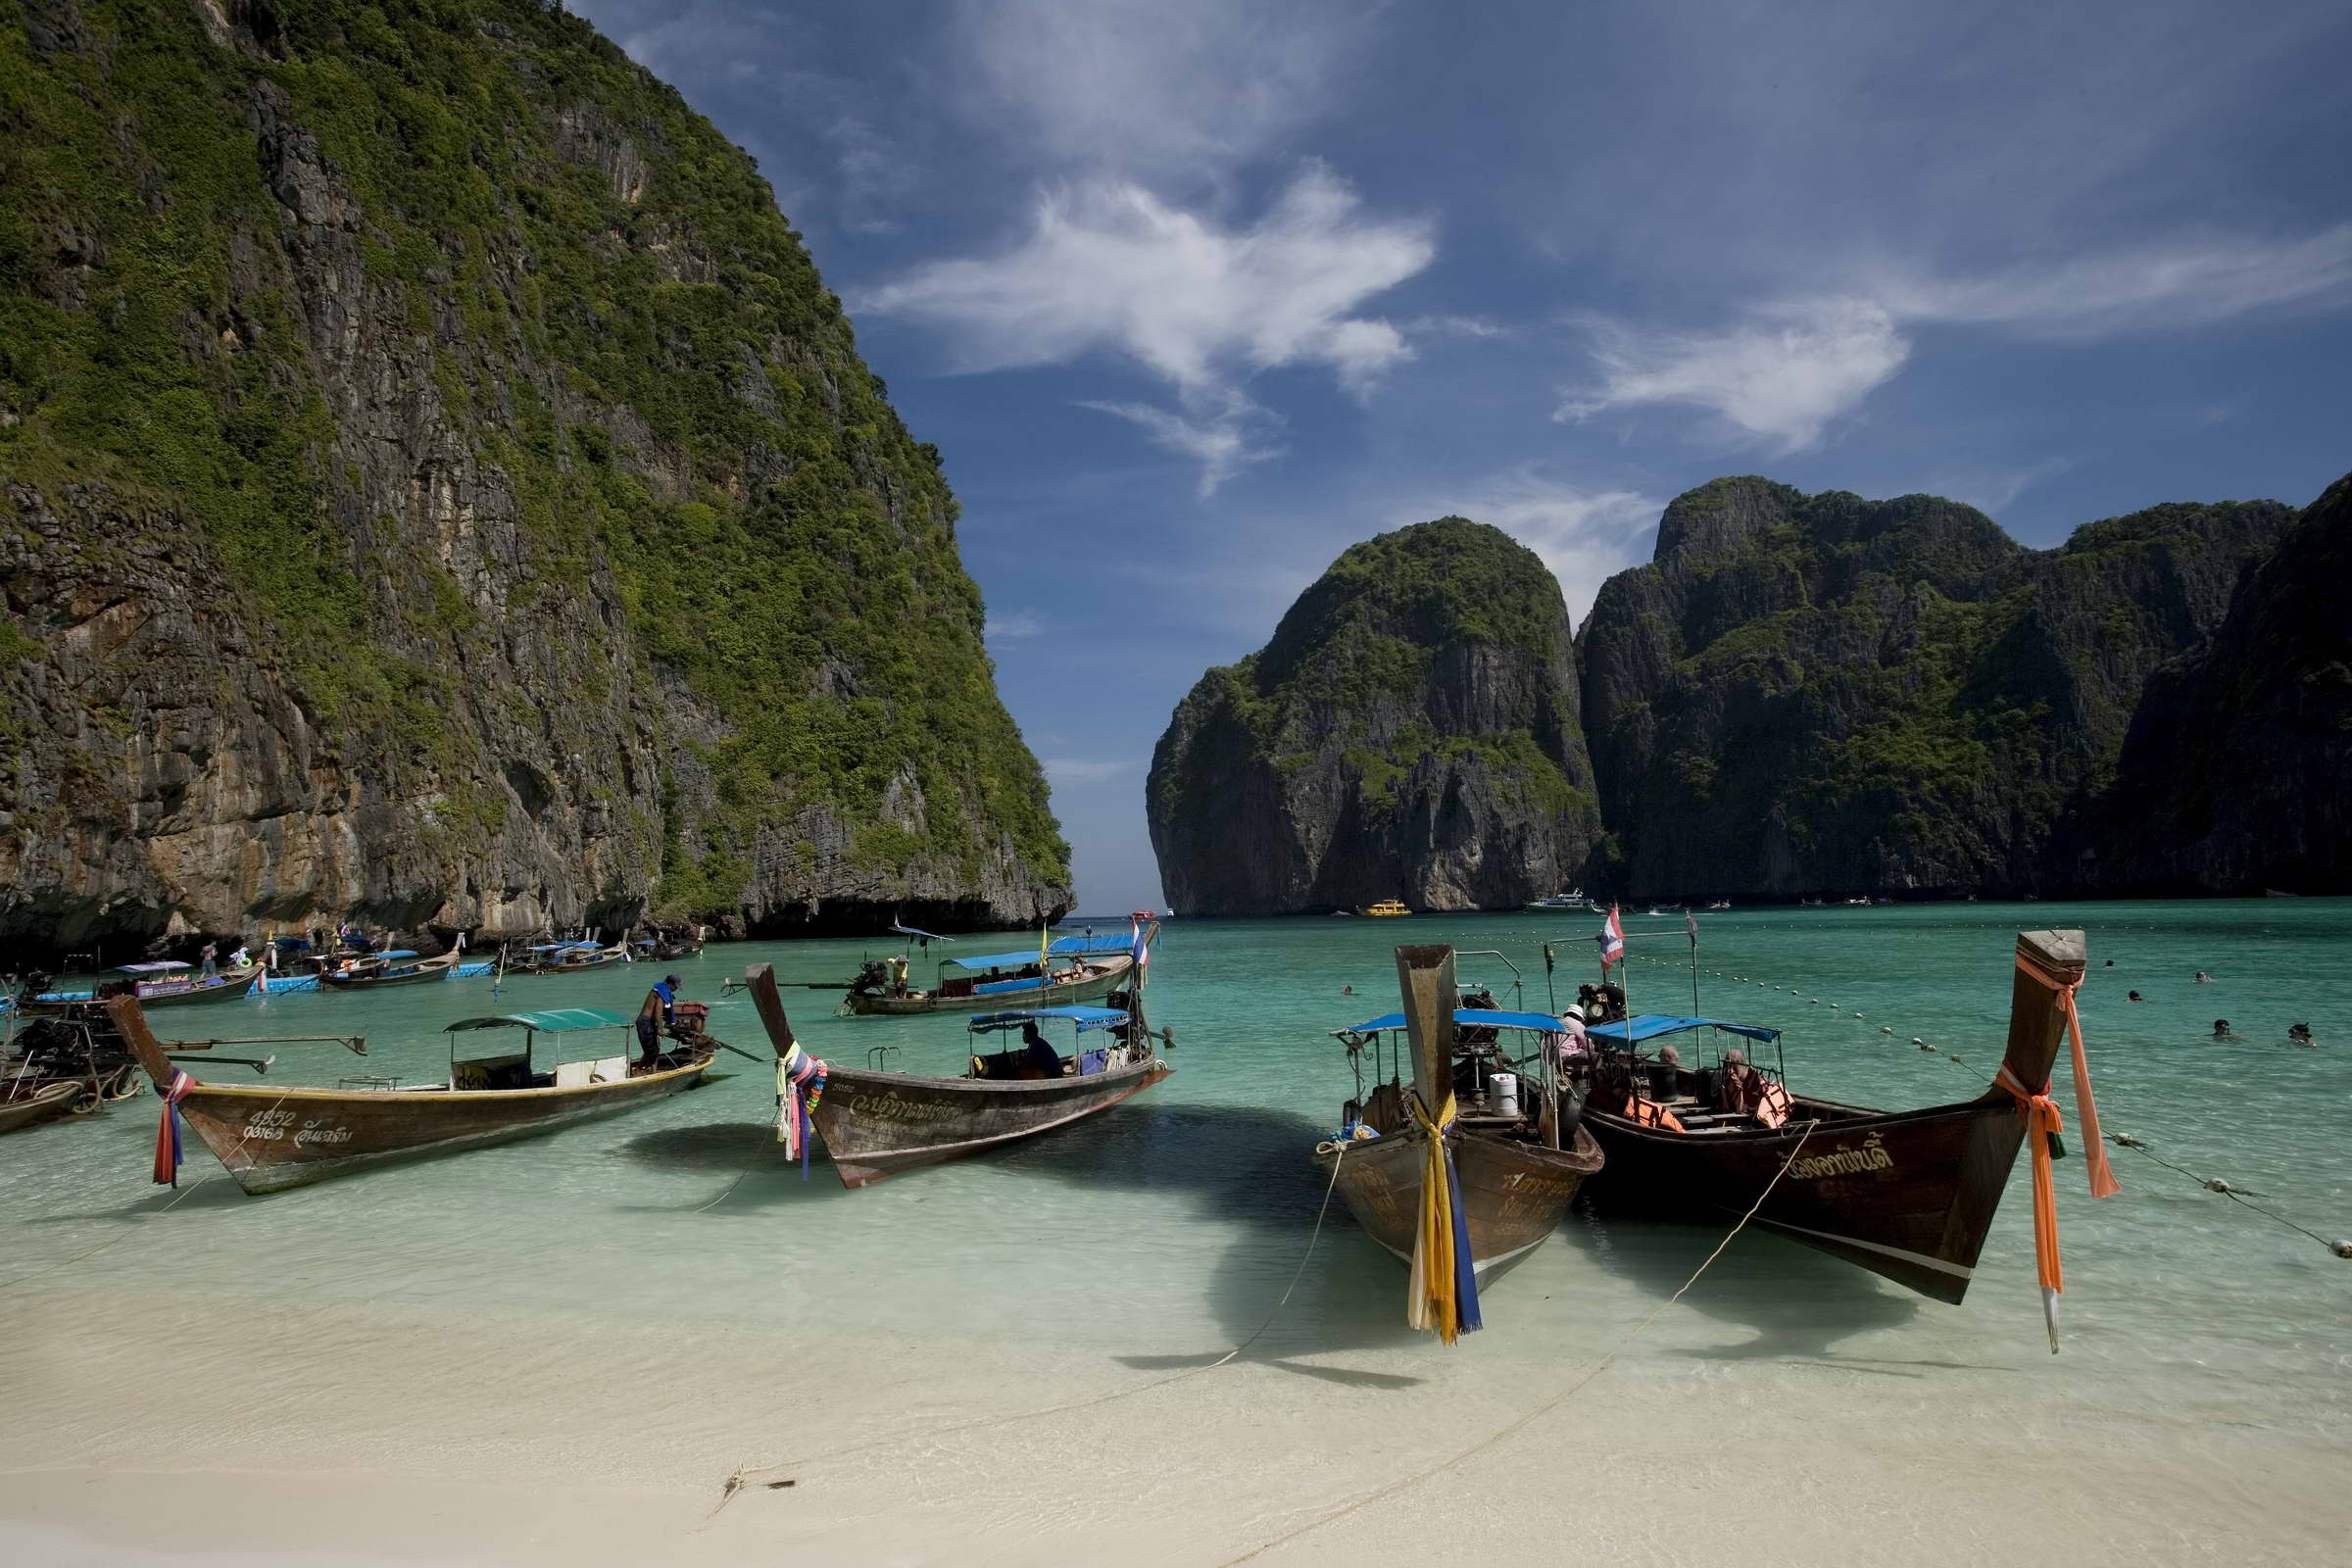 Maya Bay, Phi Phi Le Island, Hat Noppharat Thara - Mu Koh Phi Phi National Park, Krabi